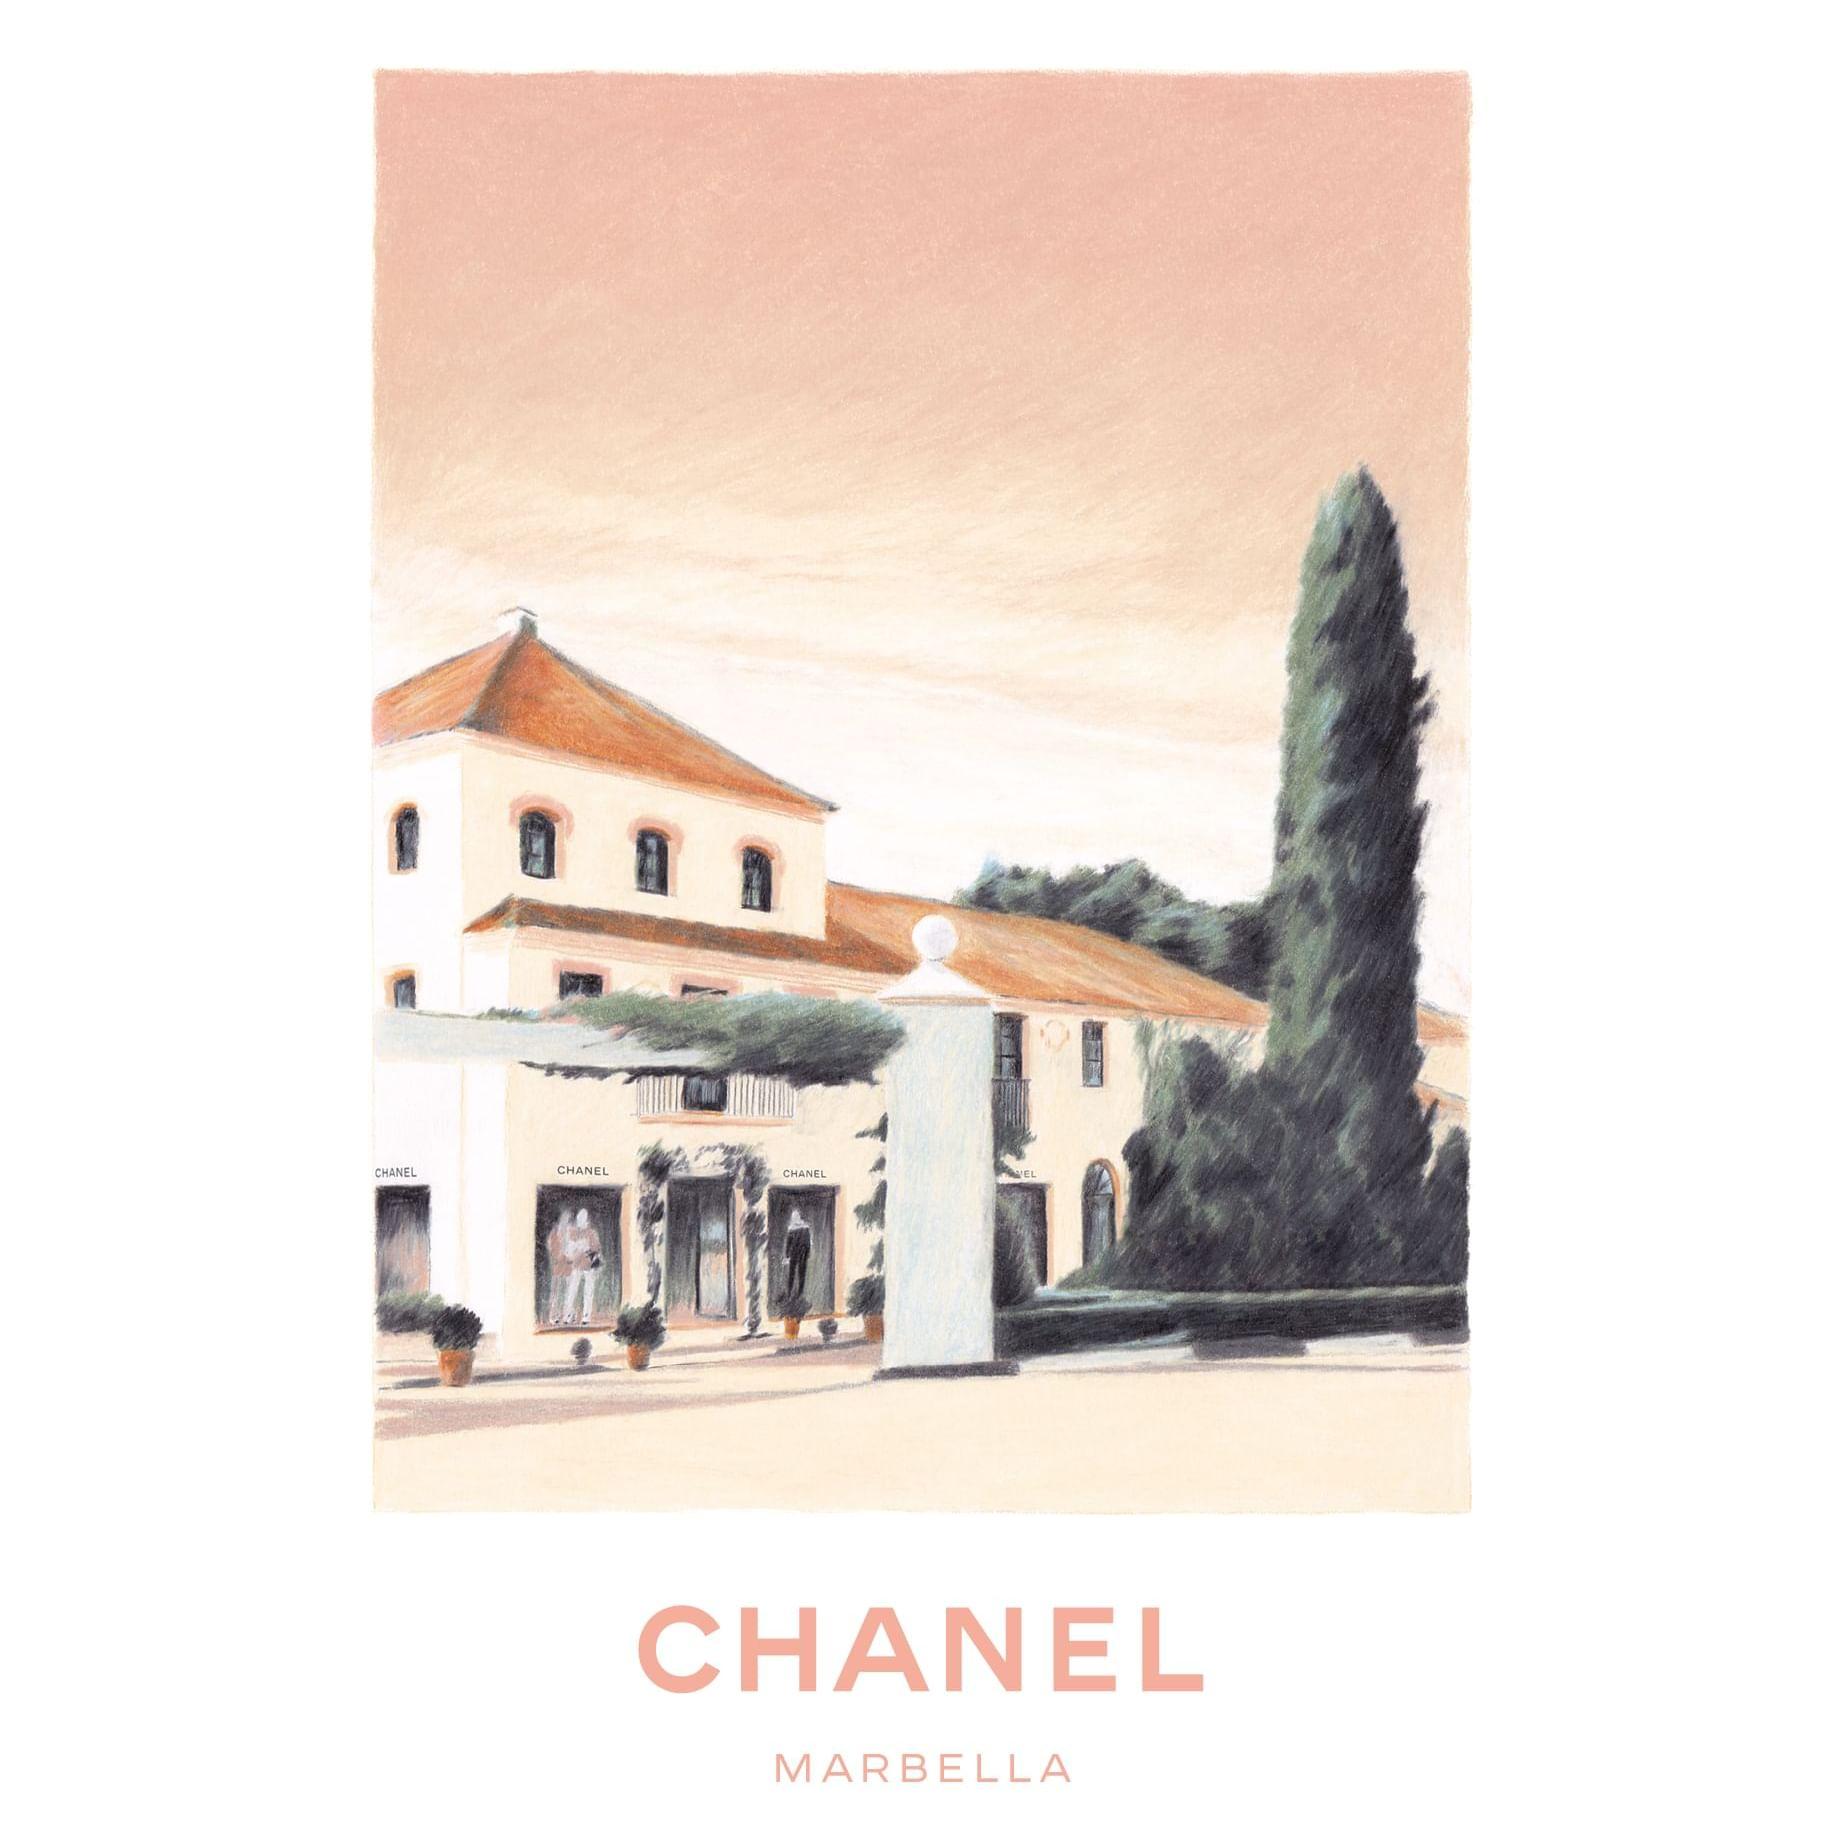 Chanel boutique at the Marbella Club Hotel